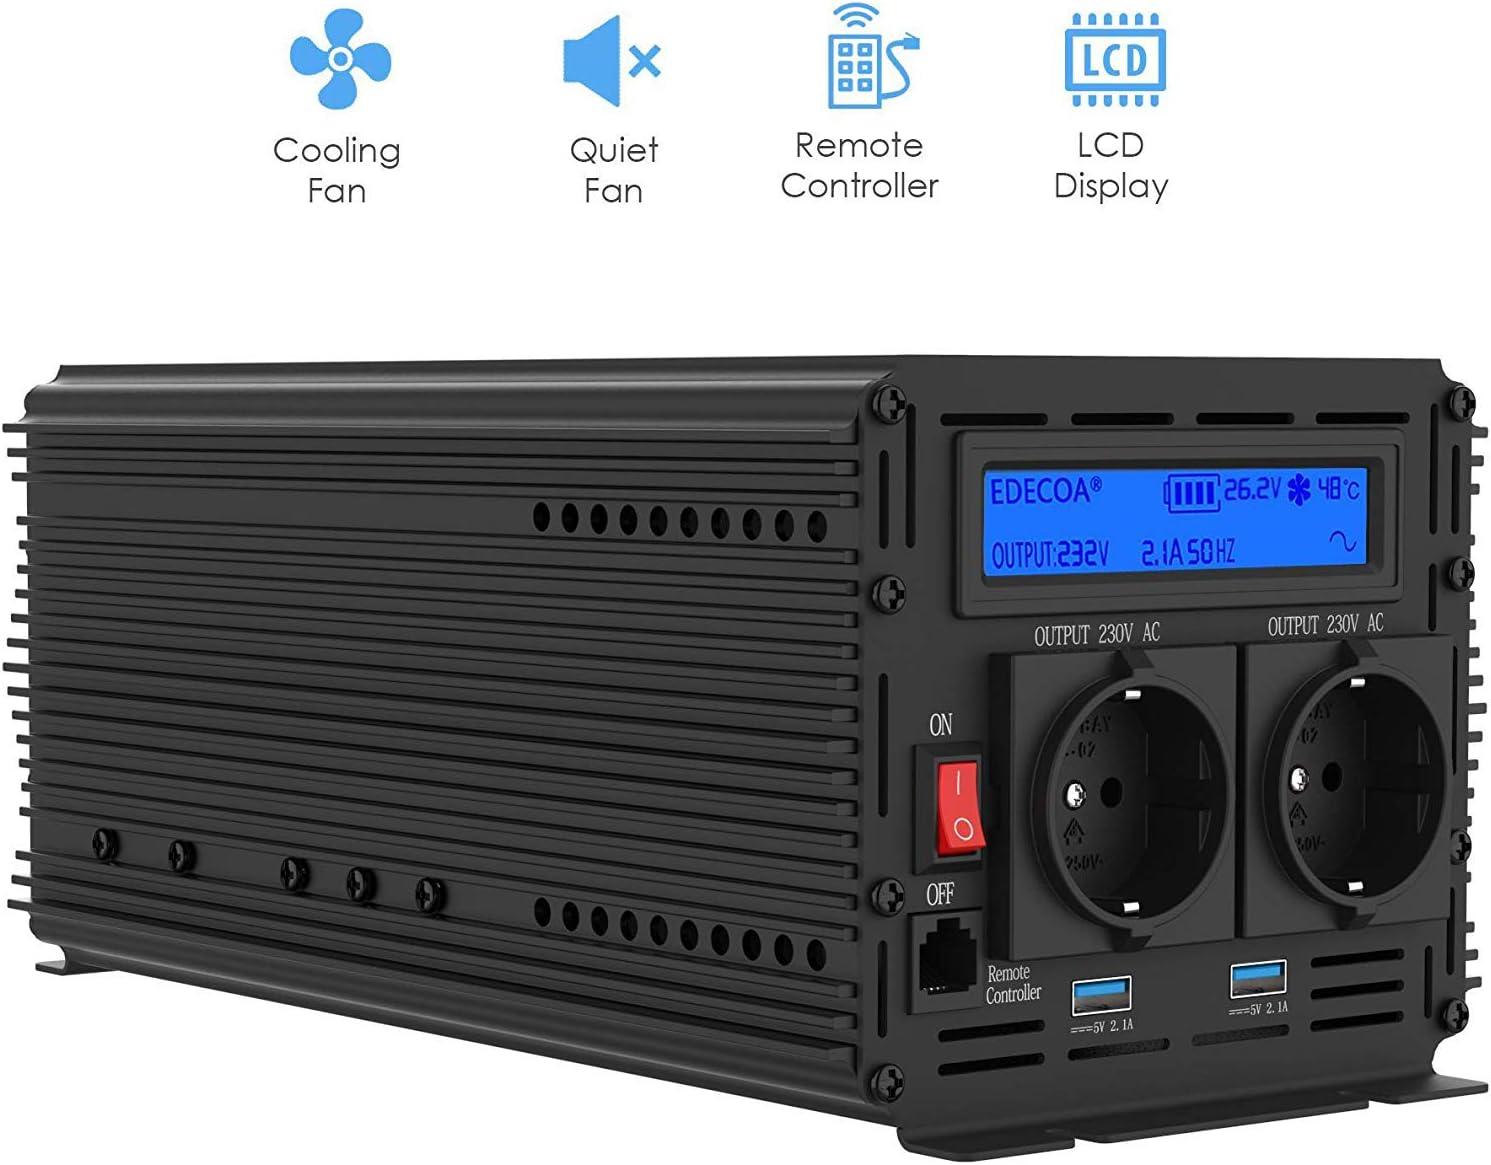 EDECOA Inversor 24v 220v Onda Pura 1500w con Mando a Distancia 2X USB y Pantalla LCD Convertidor 24v 220v Transformador de 1500w Pico momentaneo 3000w